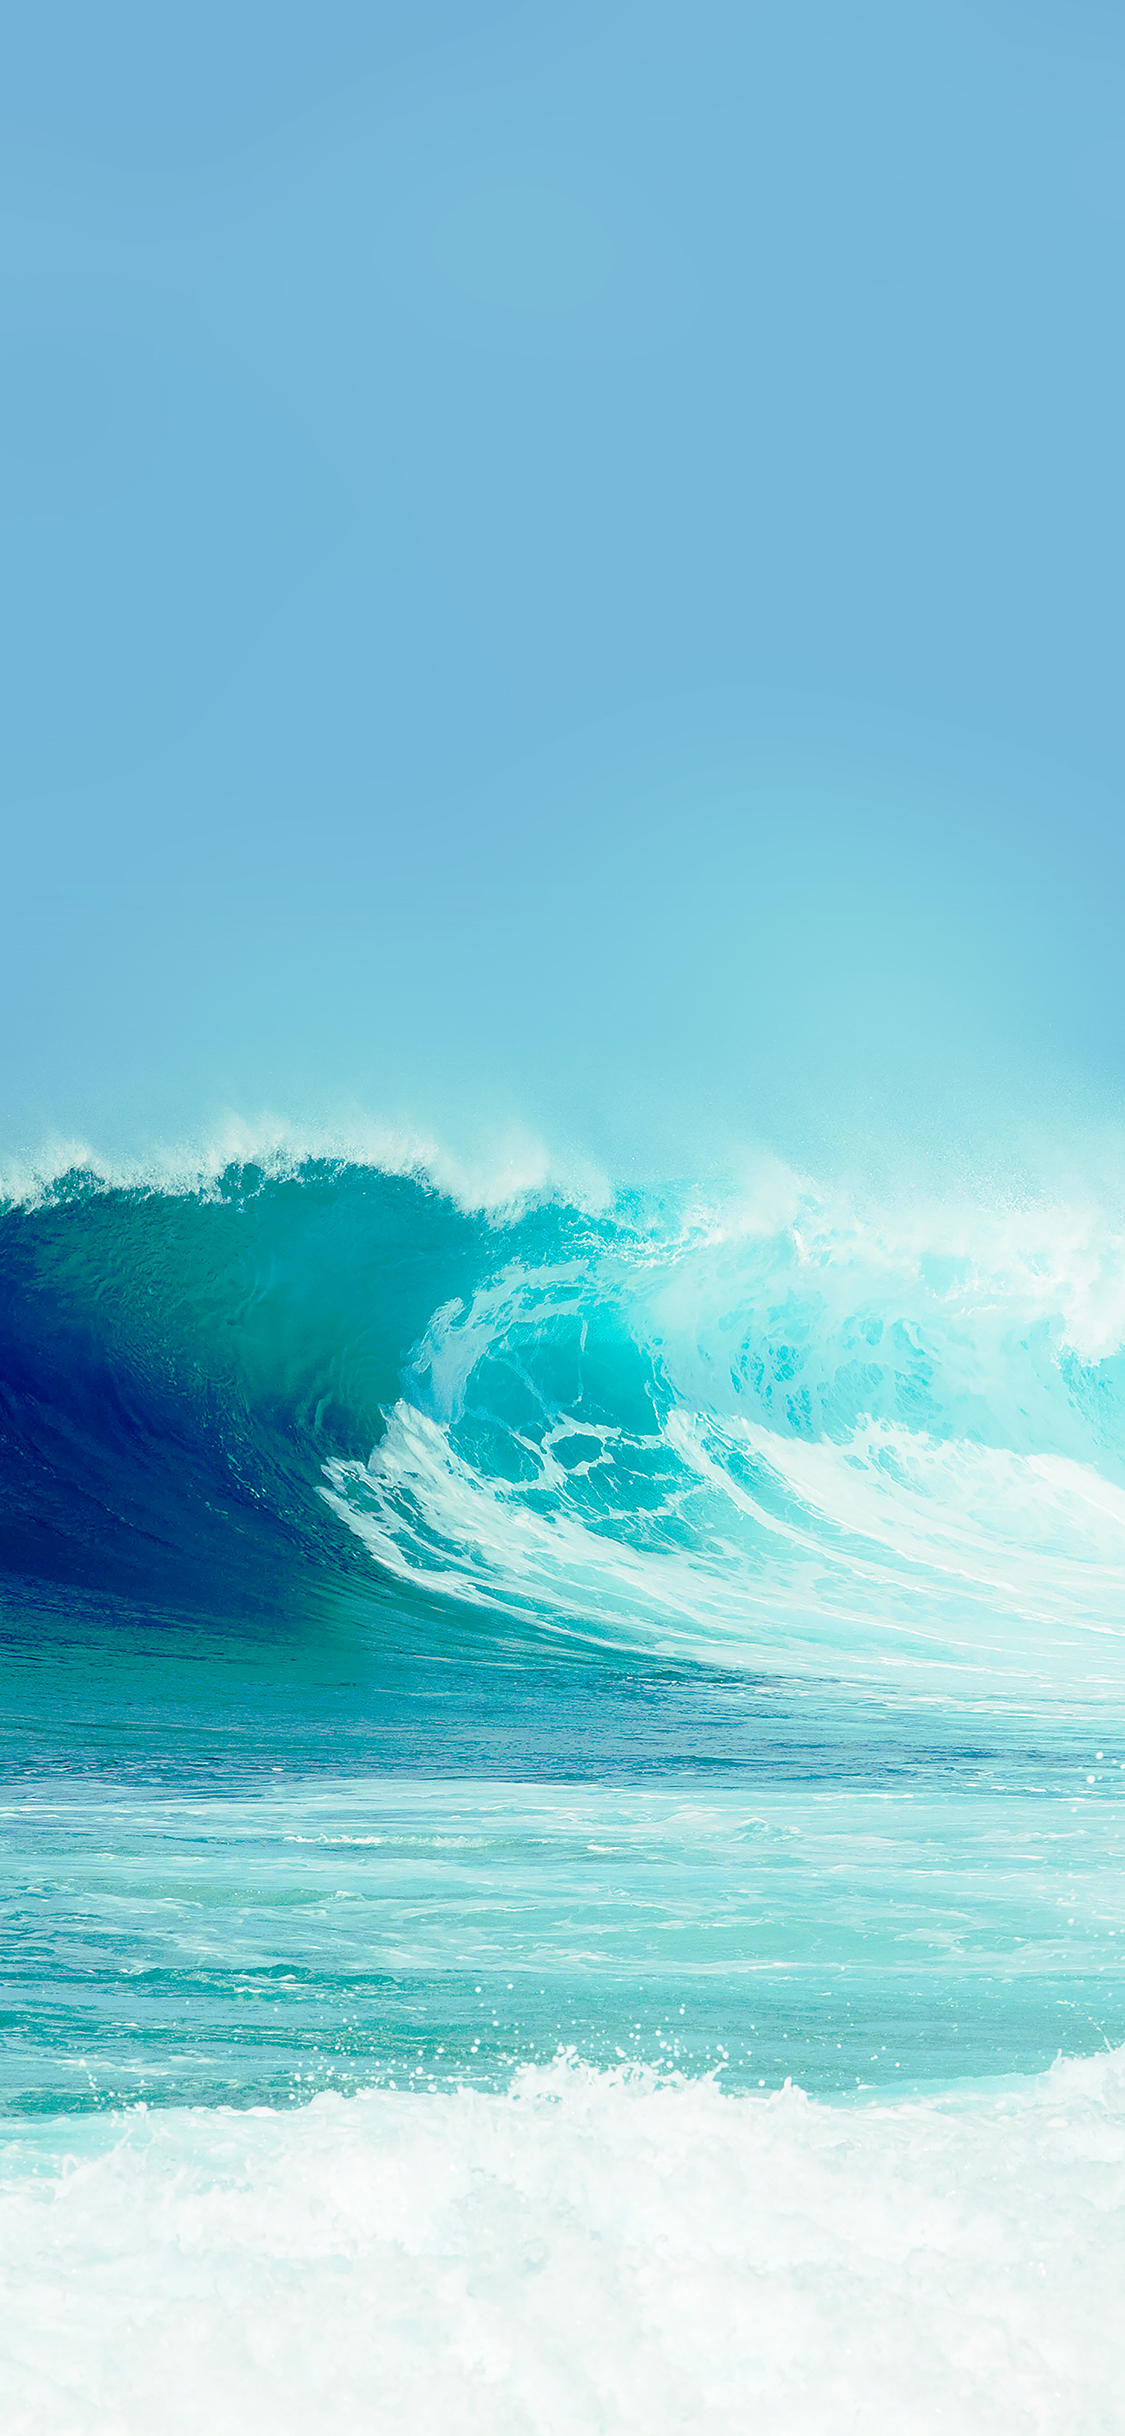 iPhoneXpapers.com-Apple-iPhone-wallpaper-mf99-breaking-good-wave-light-ocean-sea-day-nature